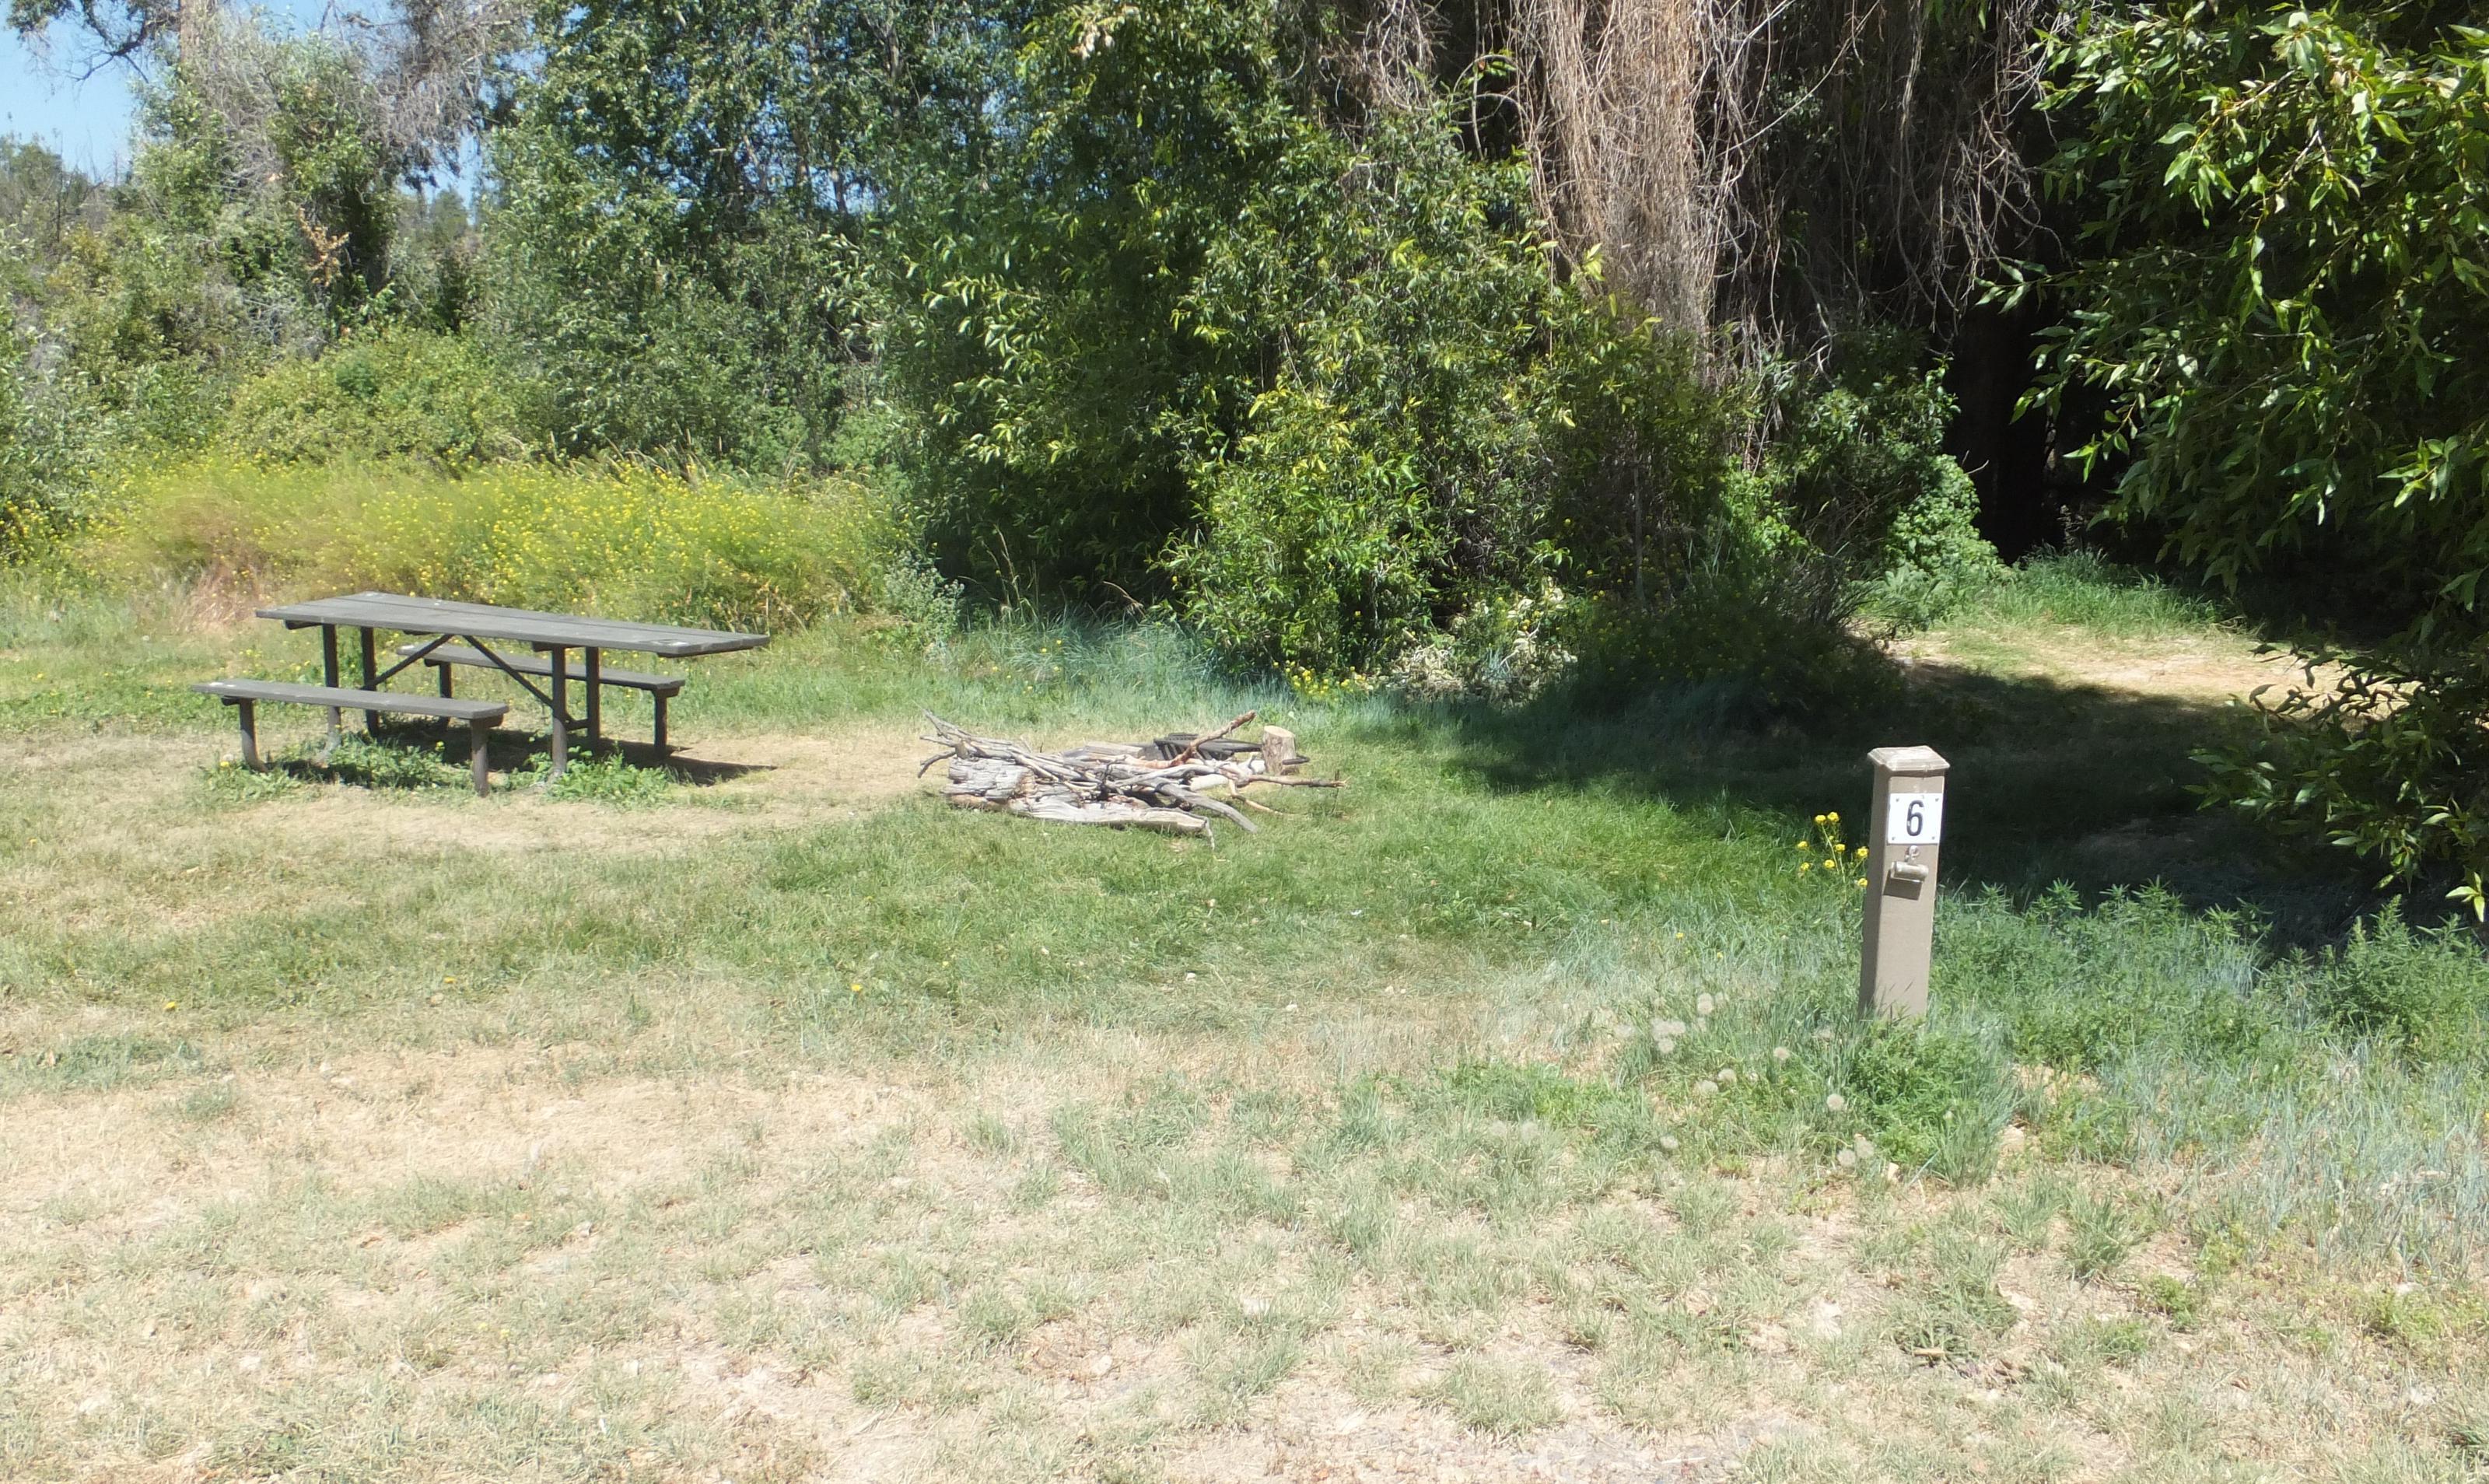 Hellgate Campground - Campsite 6